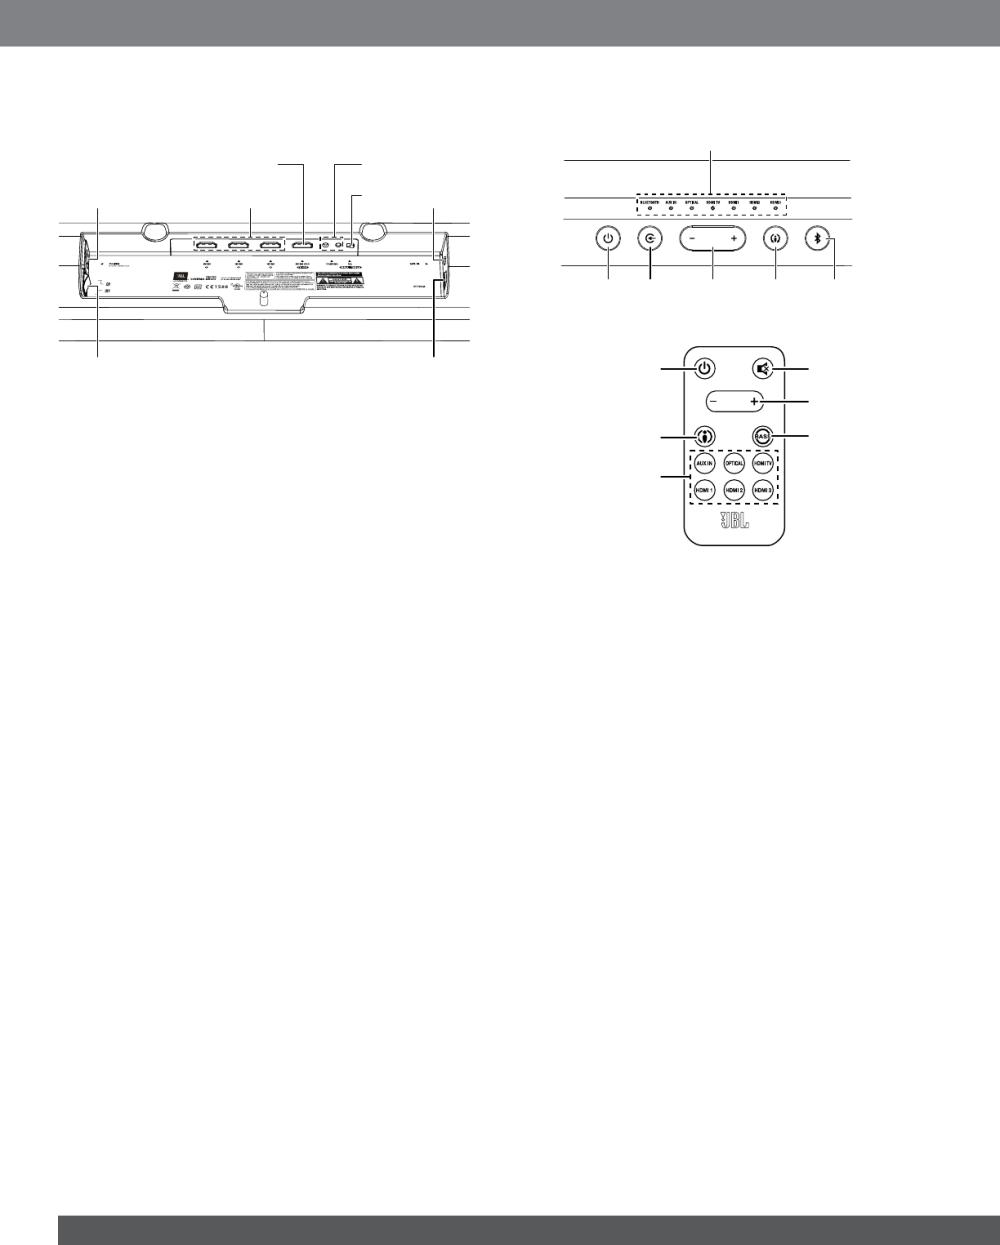 medium resolution of atemberaubend jbl crossover schaltplan bilder schaltplan ford tractor wiring diagram poulan riding mower belt diagram